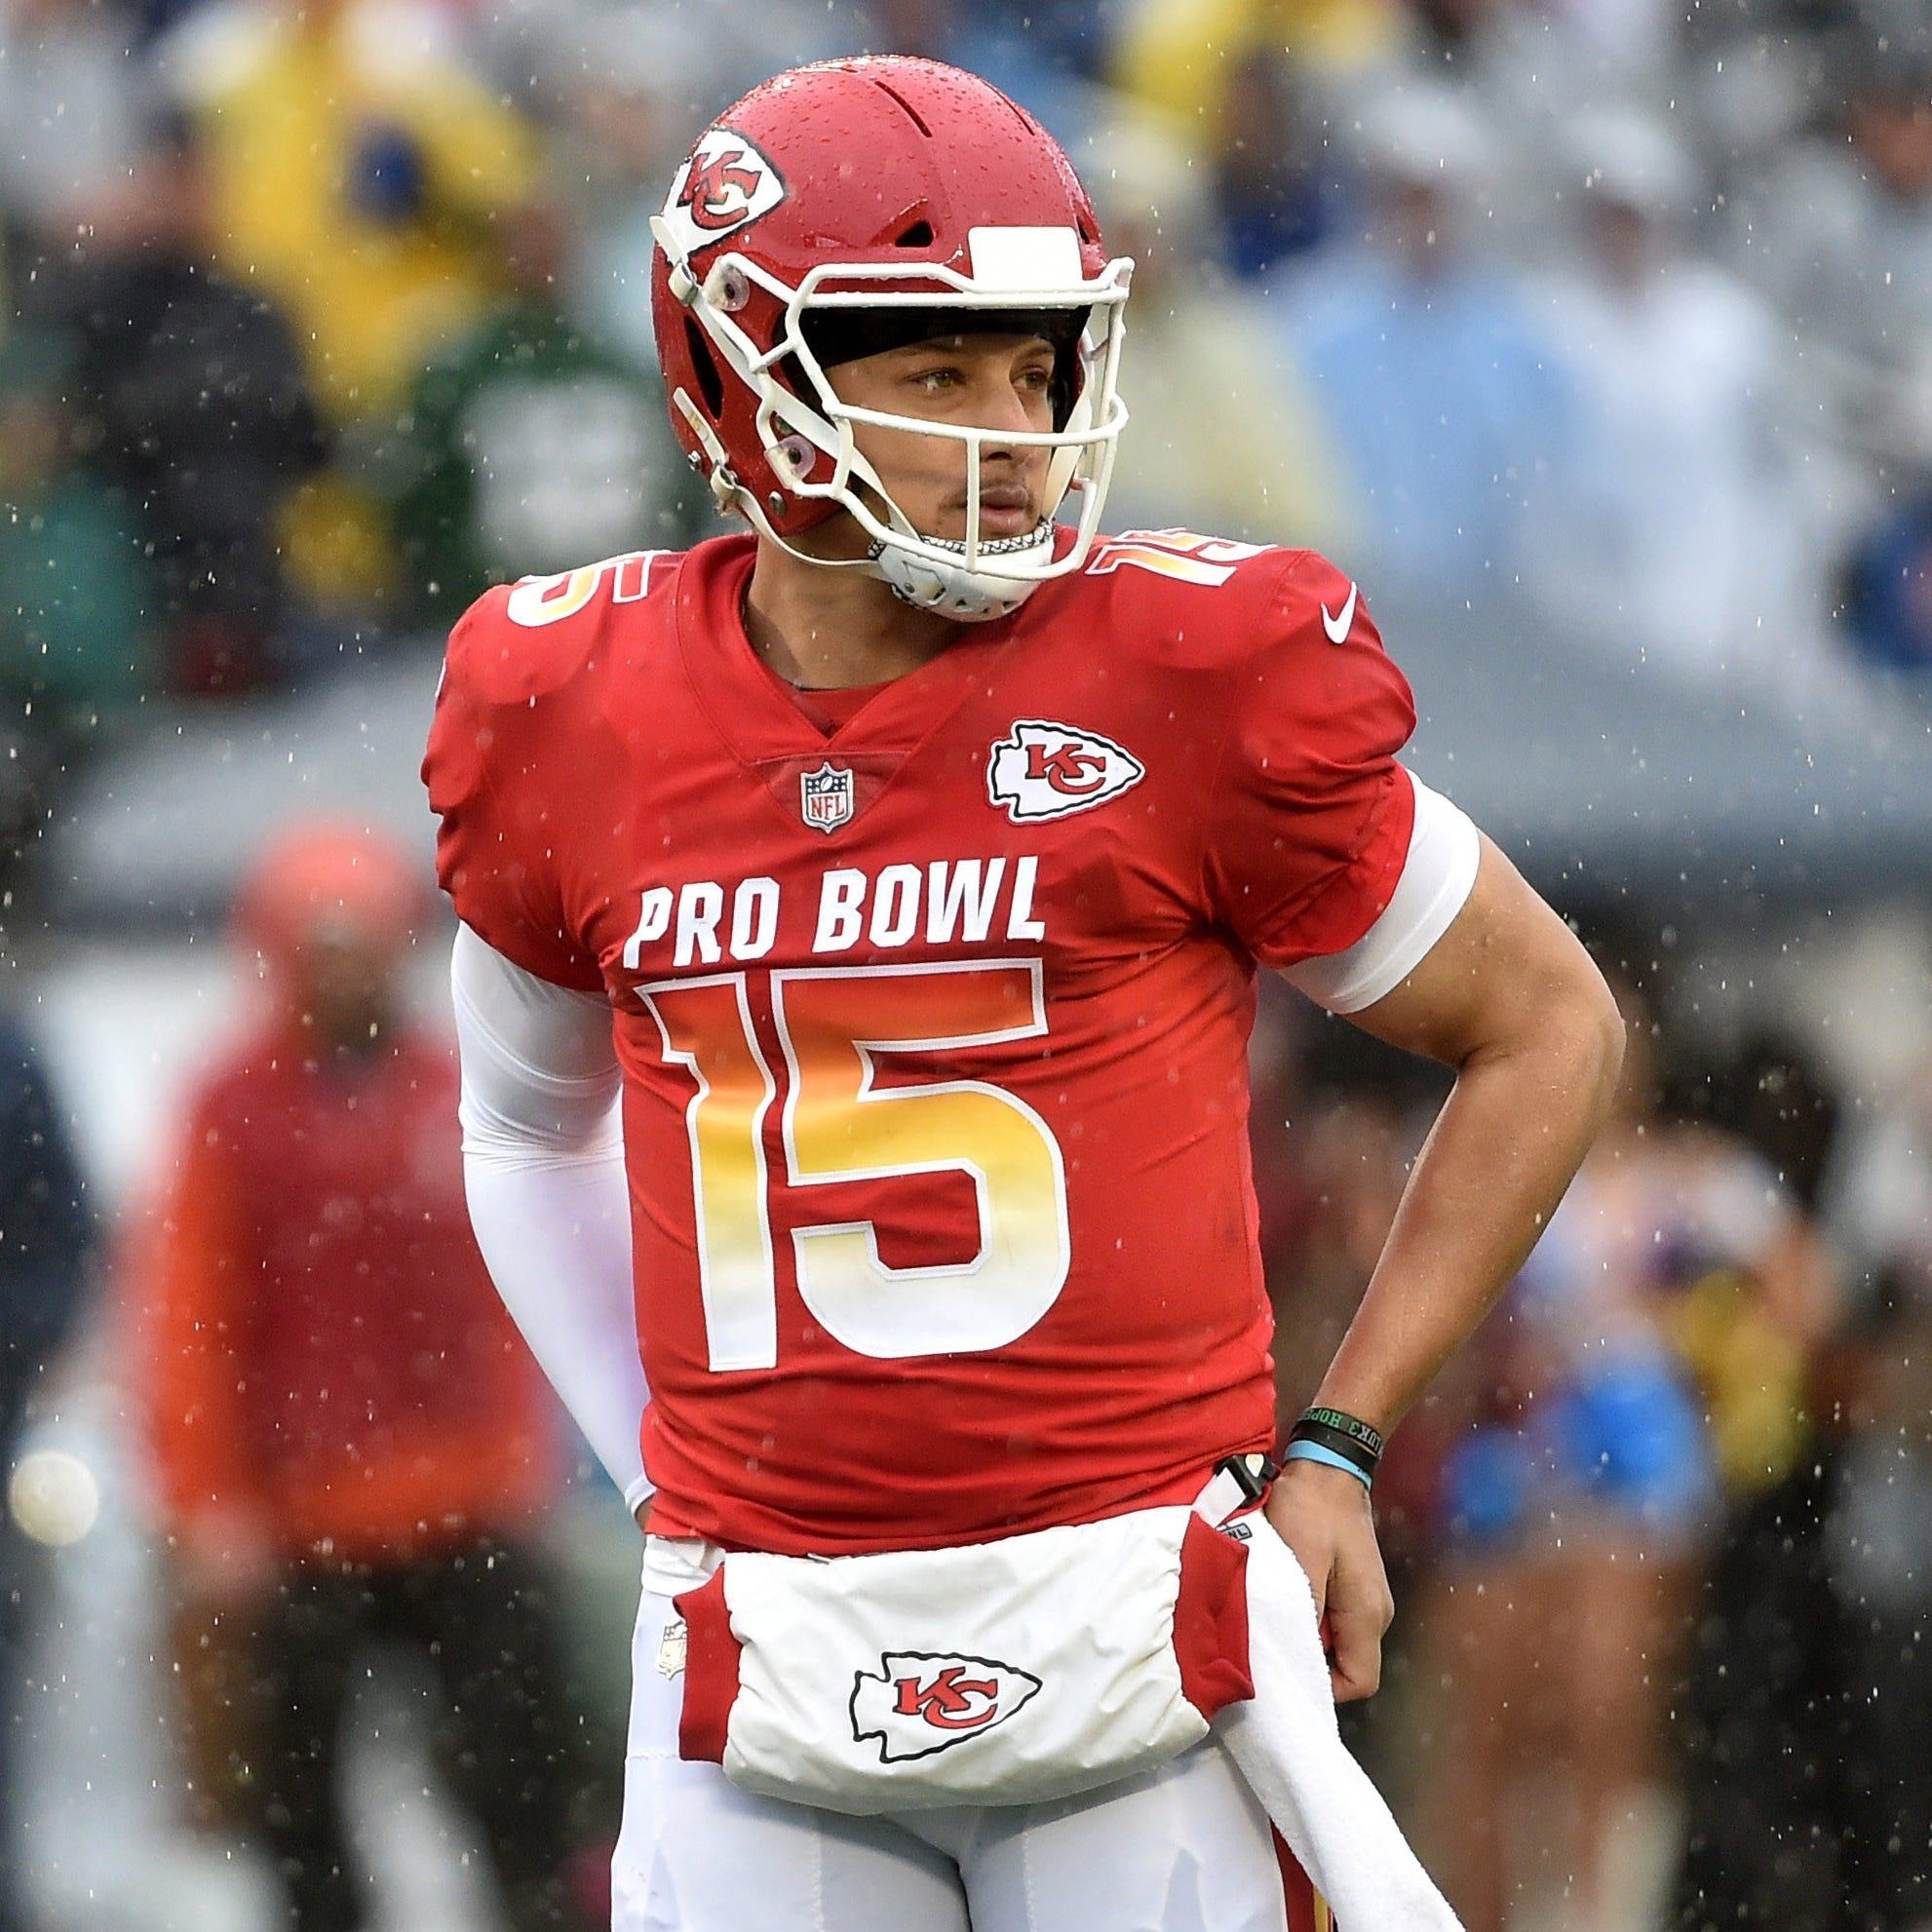 AFC quarterback Patrick Mahomes of the Kansas City Chiefs during the Pro Bowl.